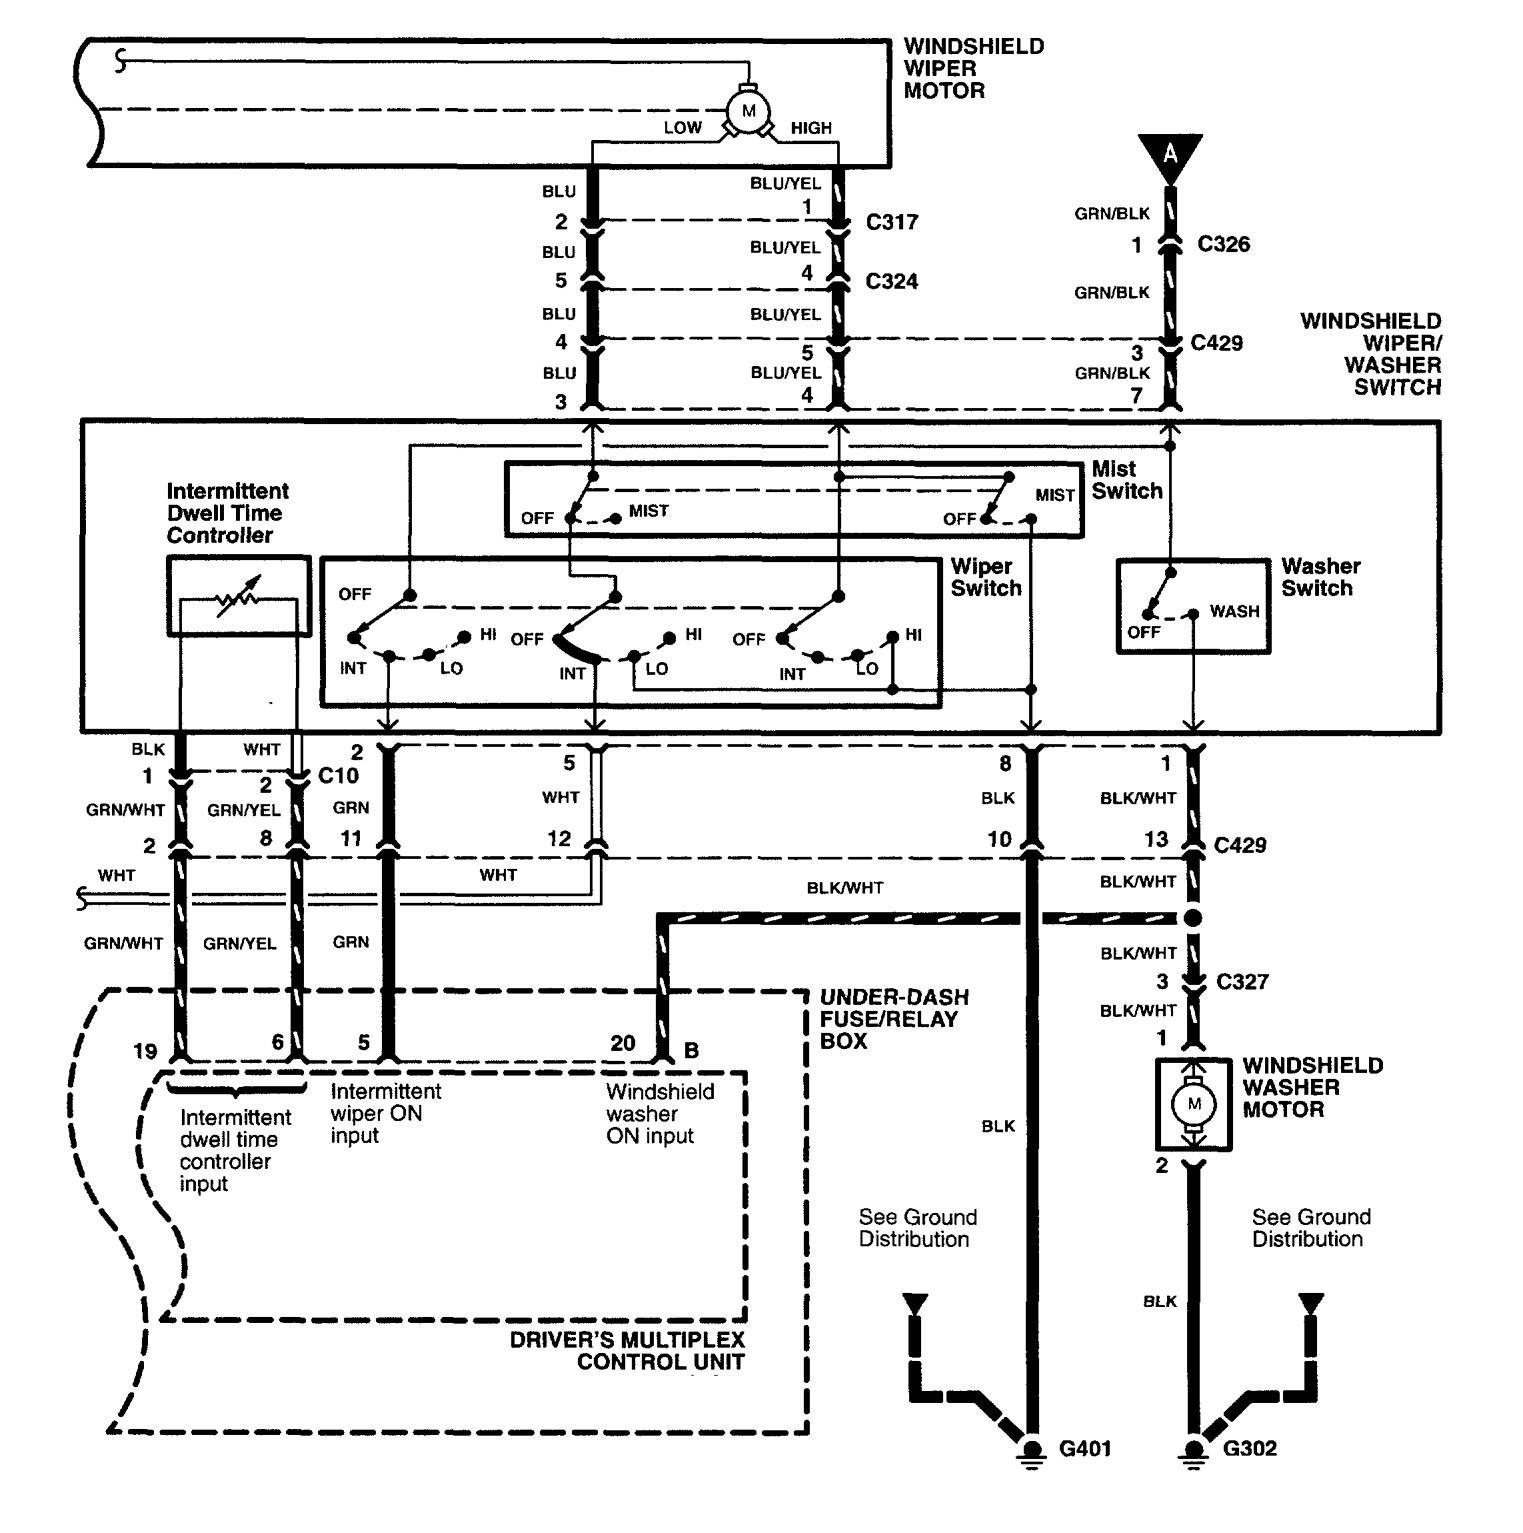 acura rsx wiring diagram 2003 automatic interlock